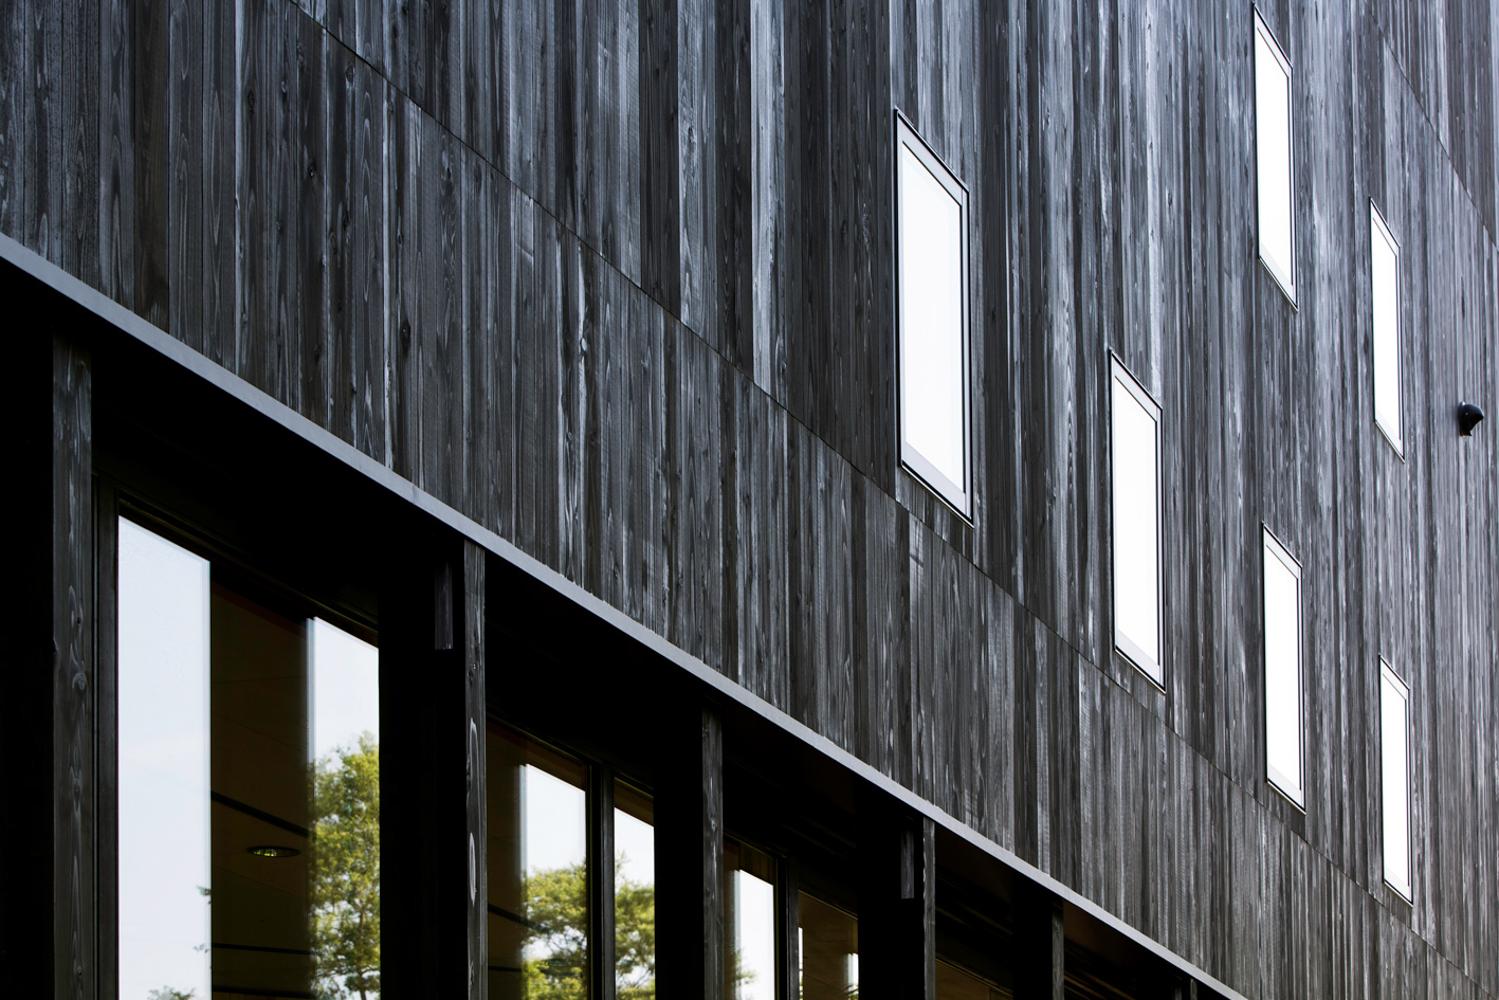 australia-house-andrew-burns-architecture-the-design-emotive-11.jpg